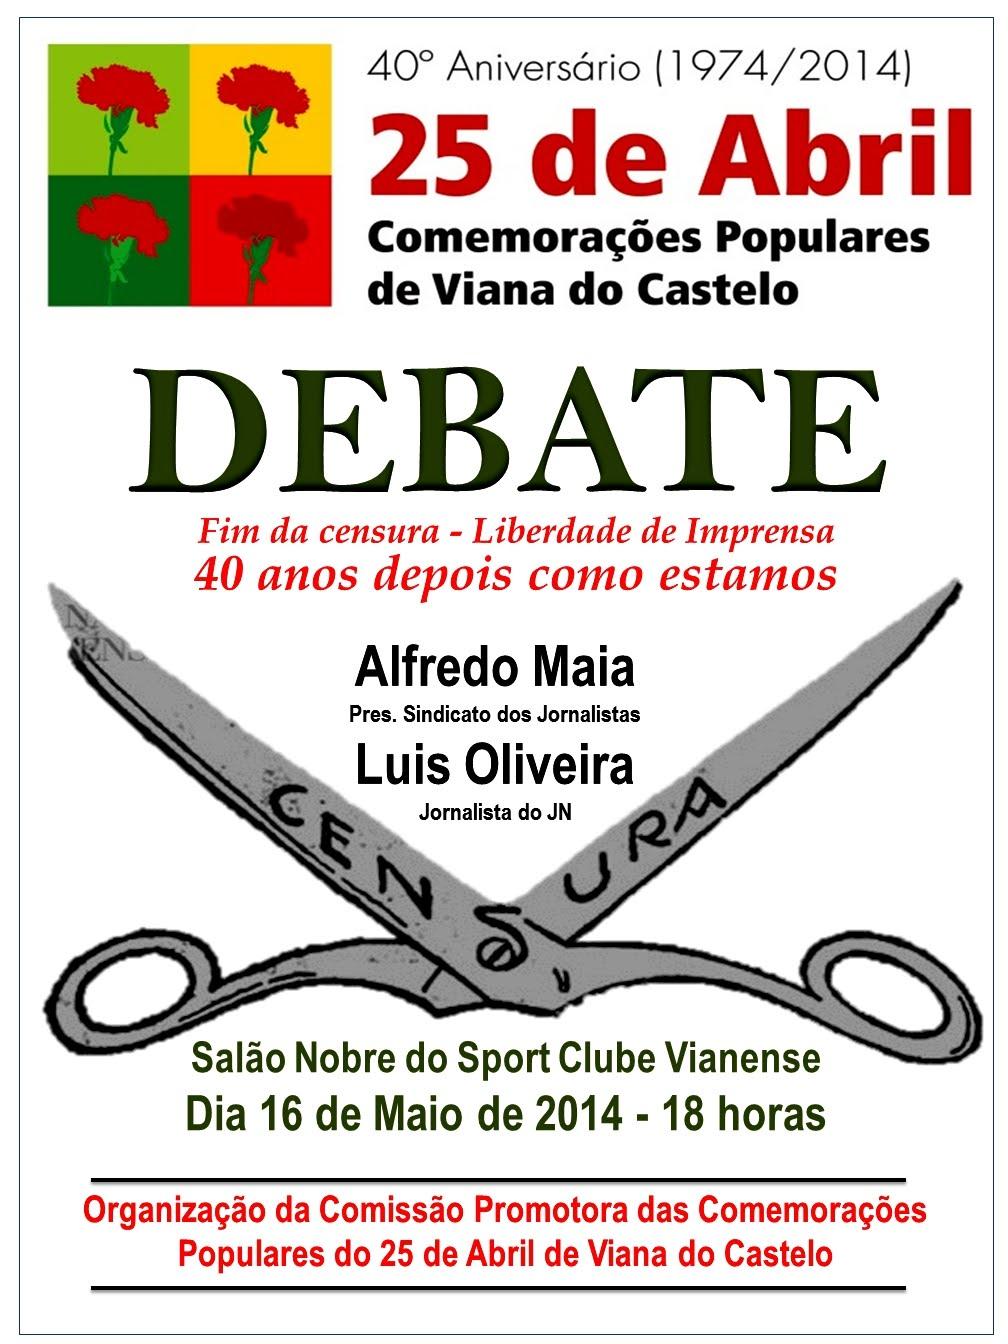 https://sites.google.com/a/centroculturaldoaltominho.org/ccam/actividades-realizadas/2014/Cartaz_A3_Debate.jpg?attredirects=0